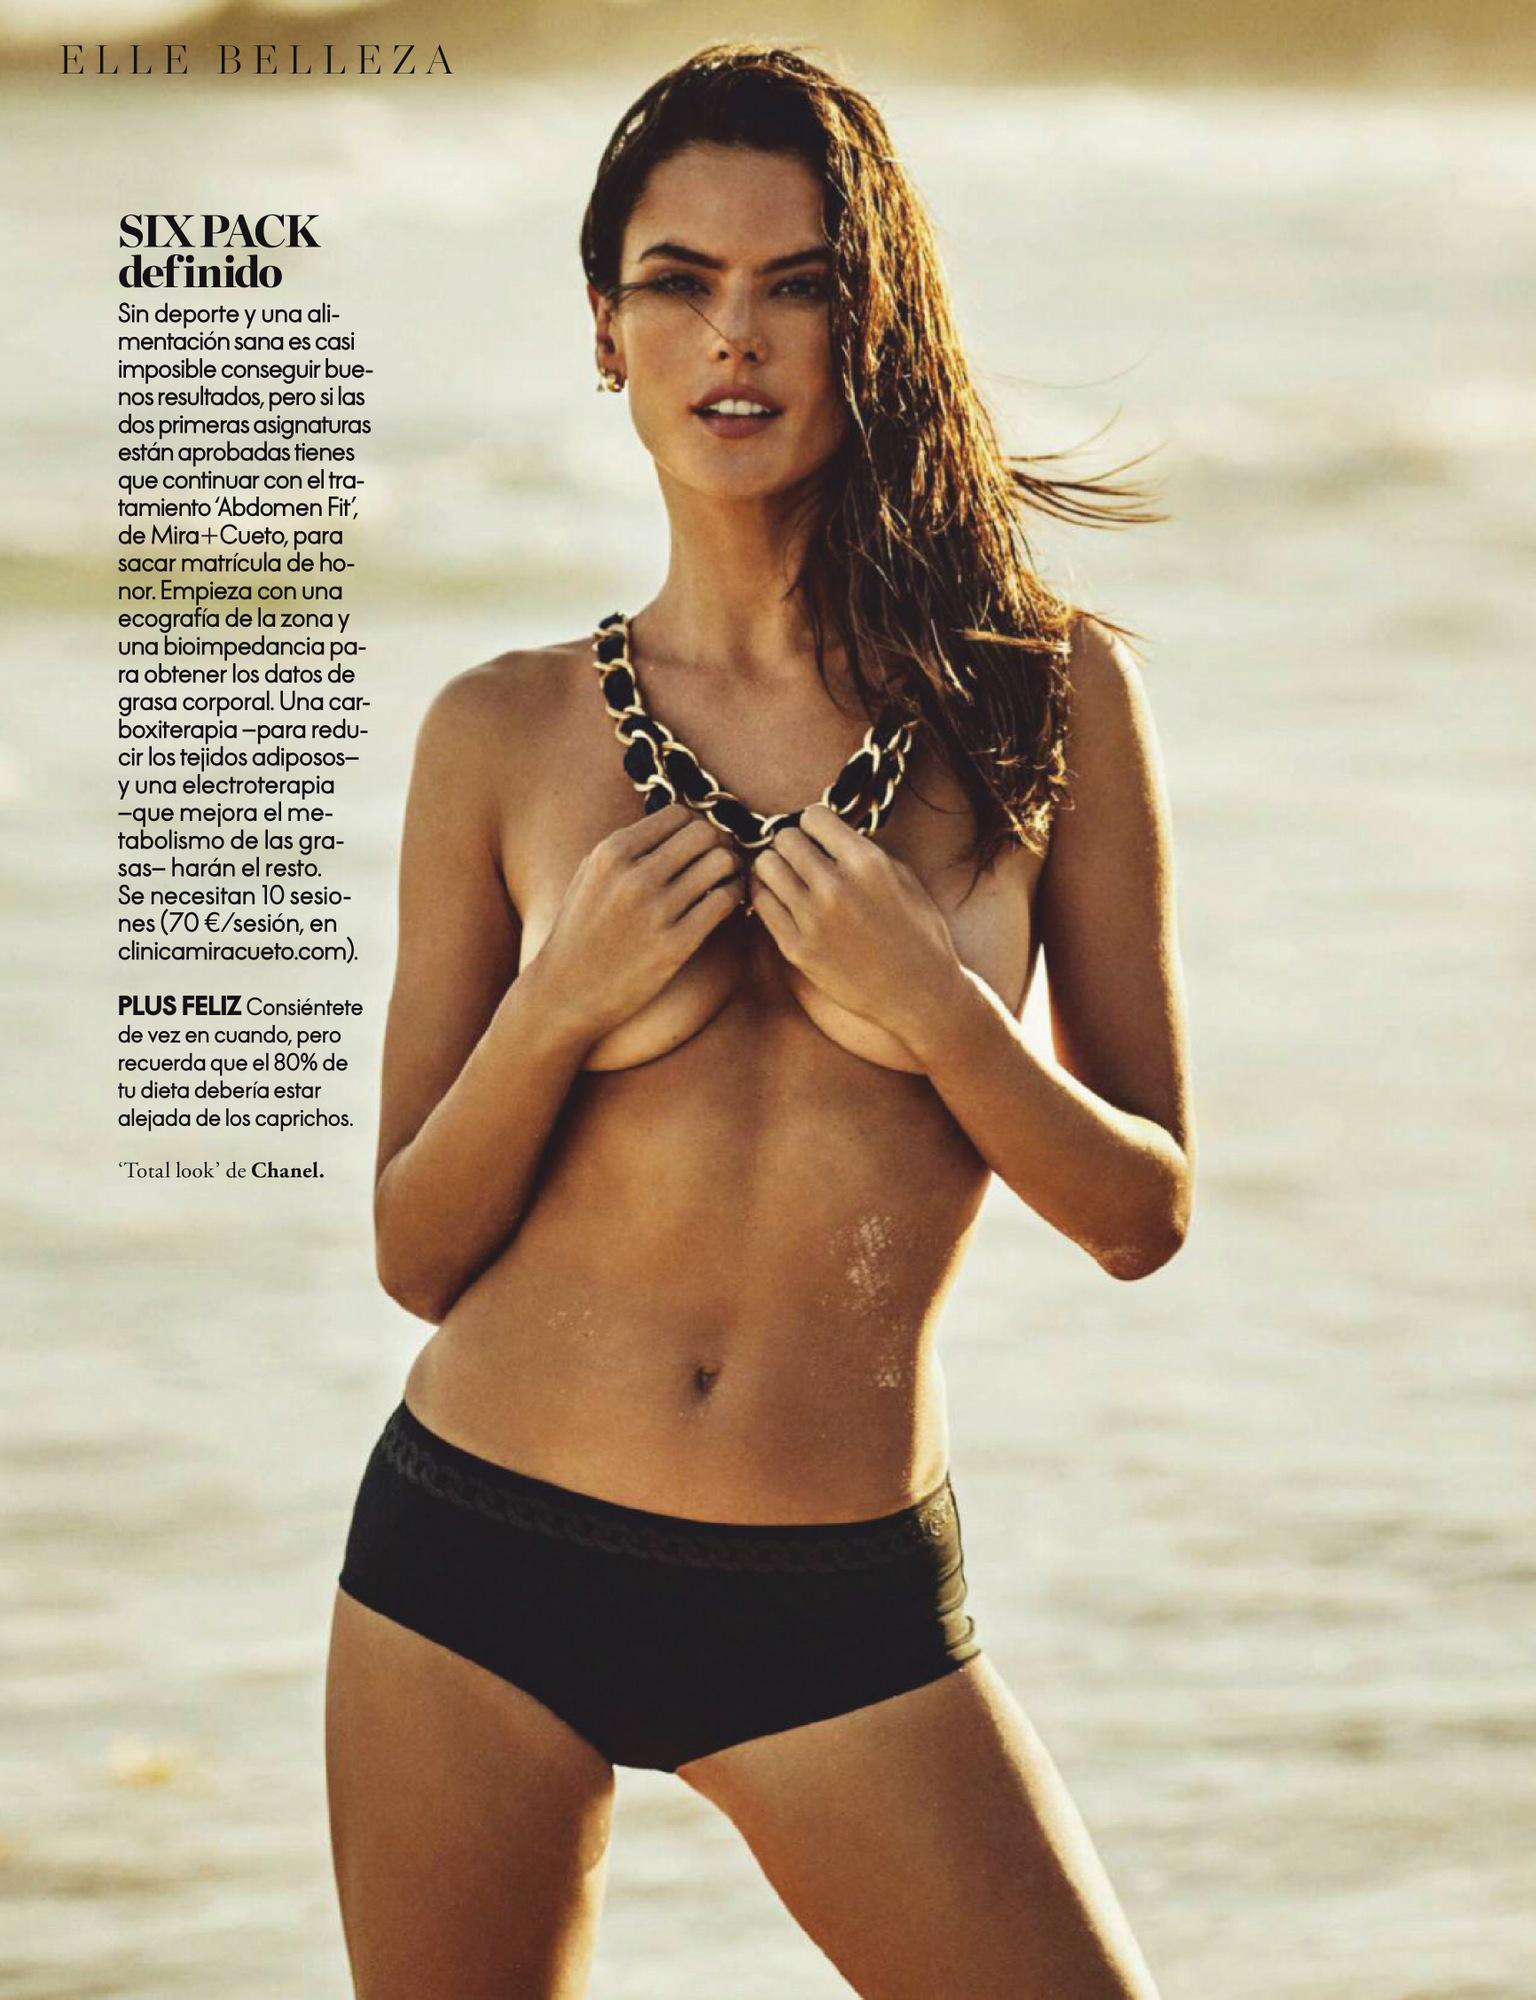 Alessandra Ambrosio – Beautiful Boobs In Sexy Photoshoot For Elle Spain Magazine (june 2020) 0011